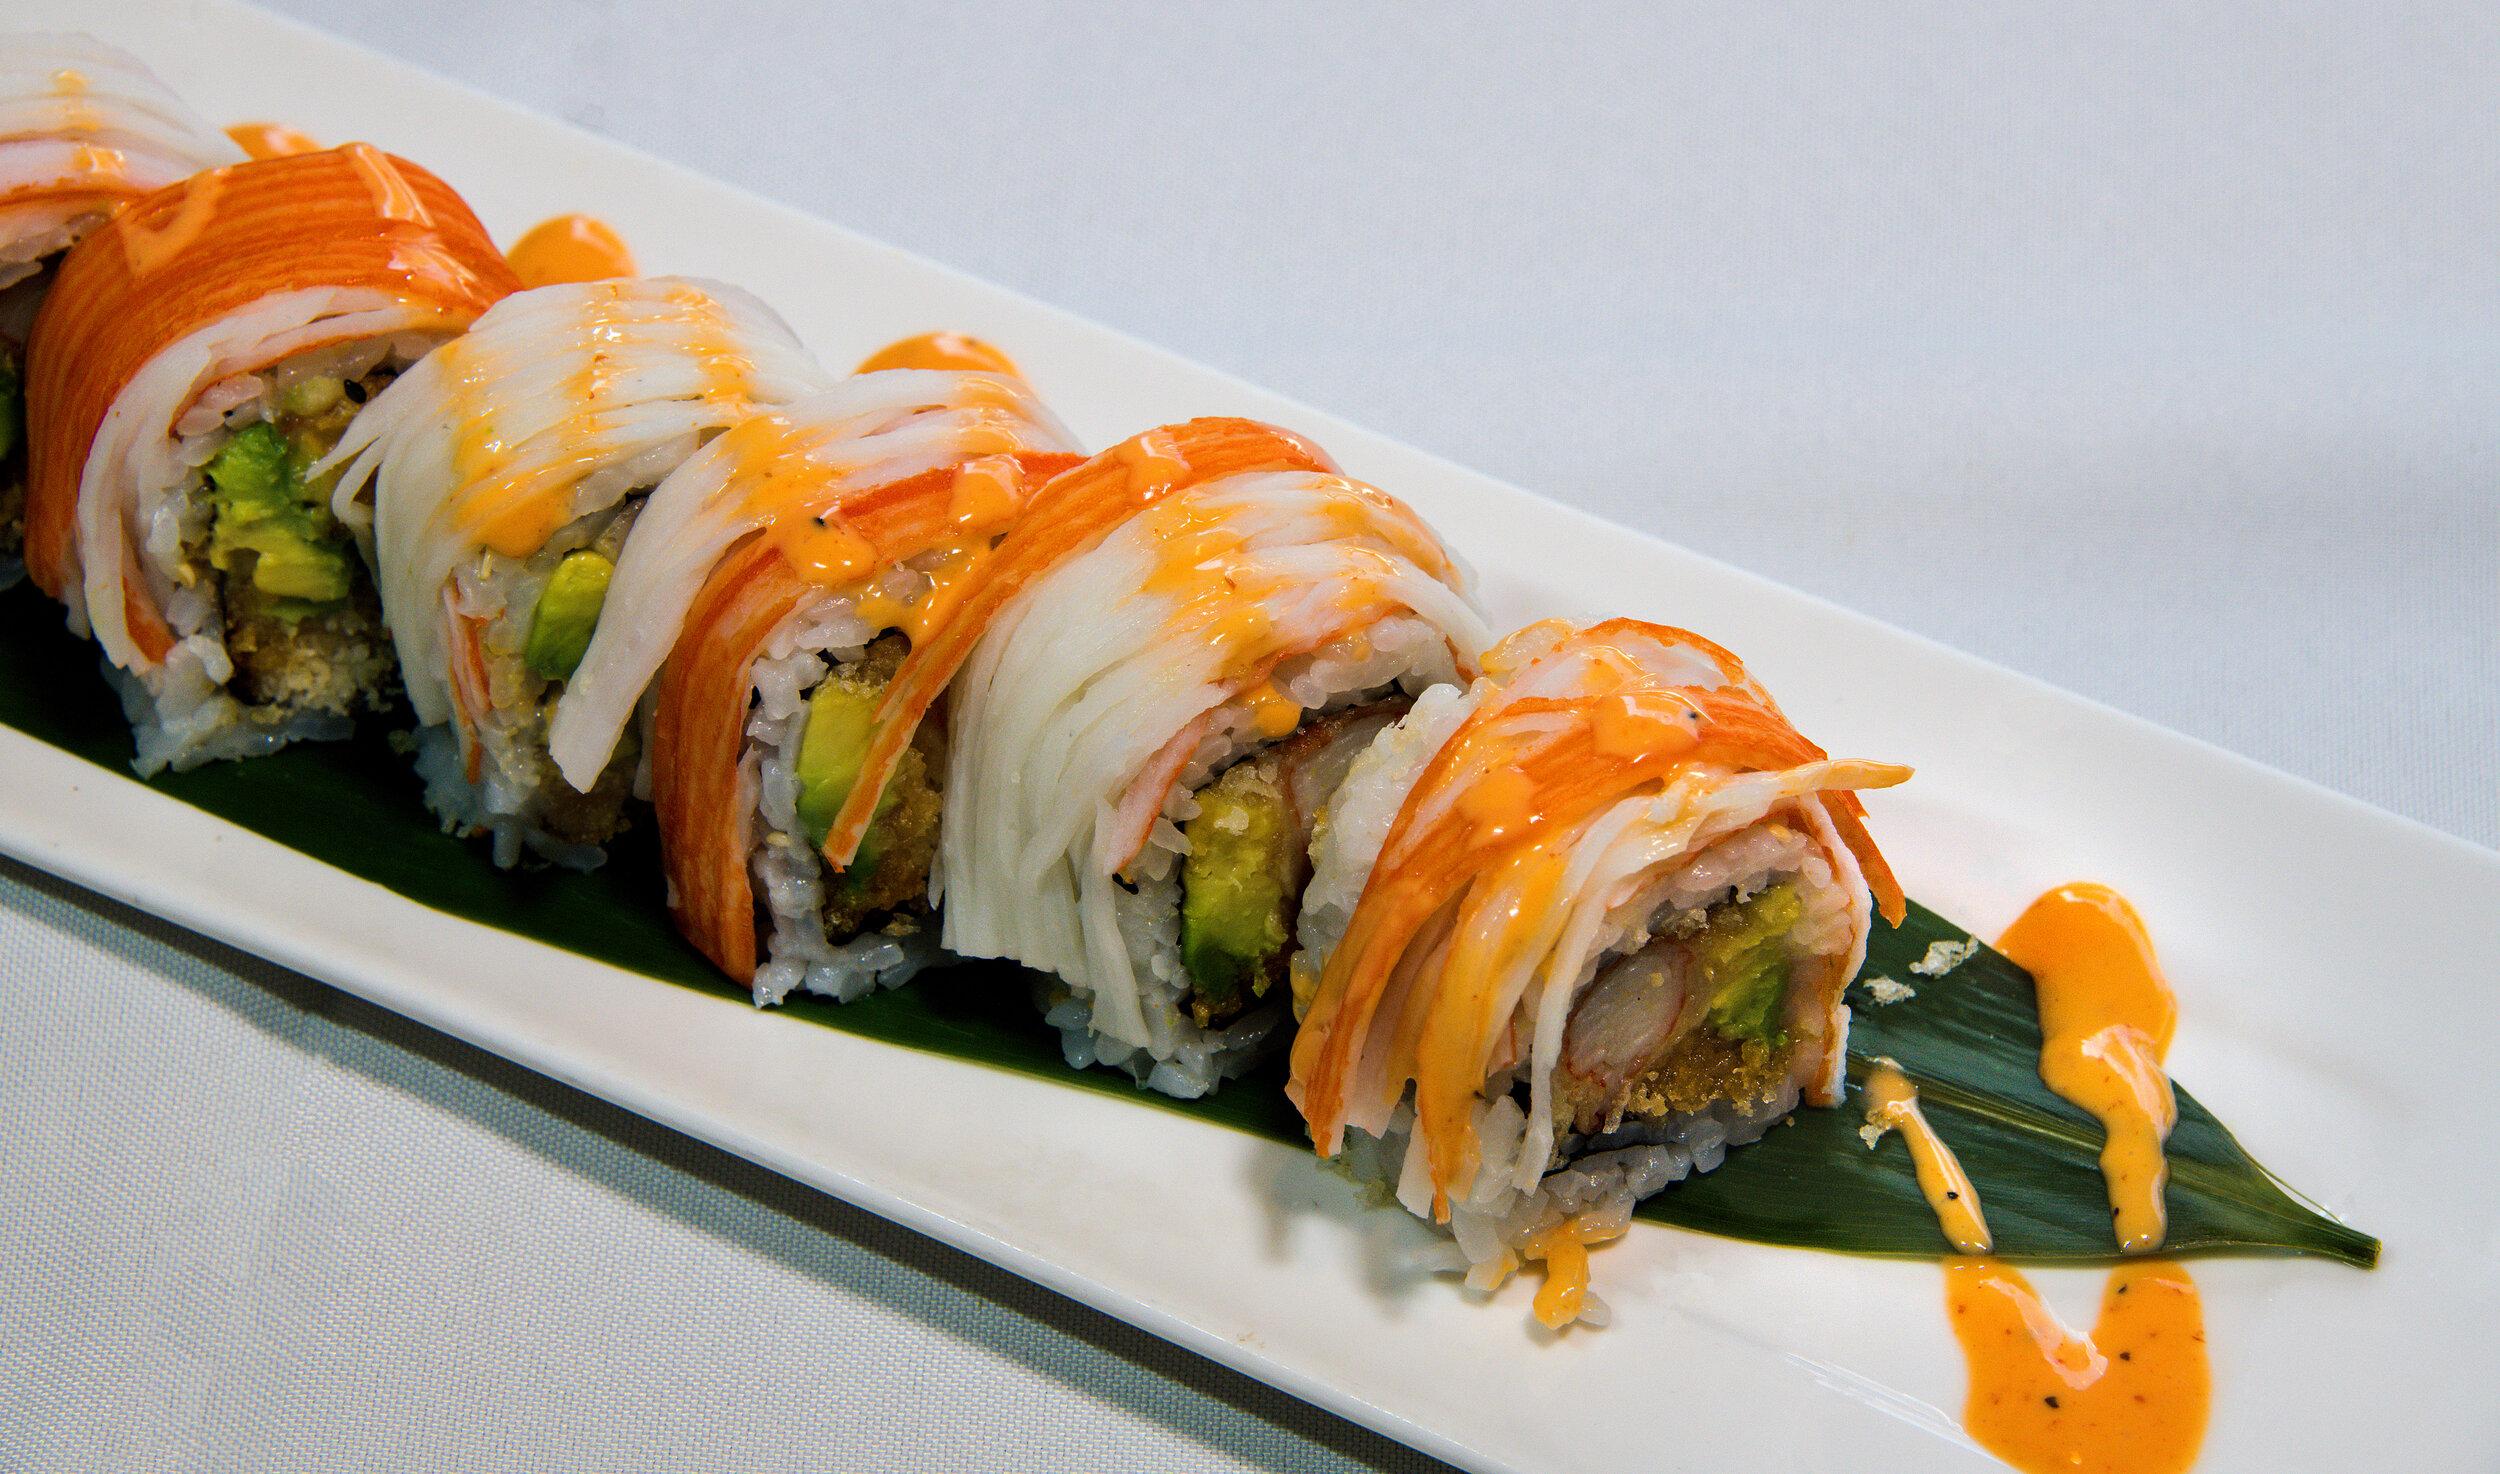 Sakura Roll (8) $9.99 Tempura Crab, Avocado, Topped w Crab & Spicy Mayo.